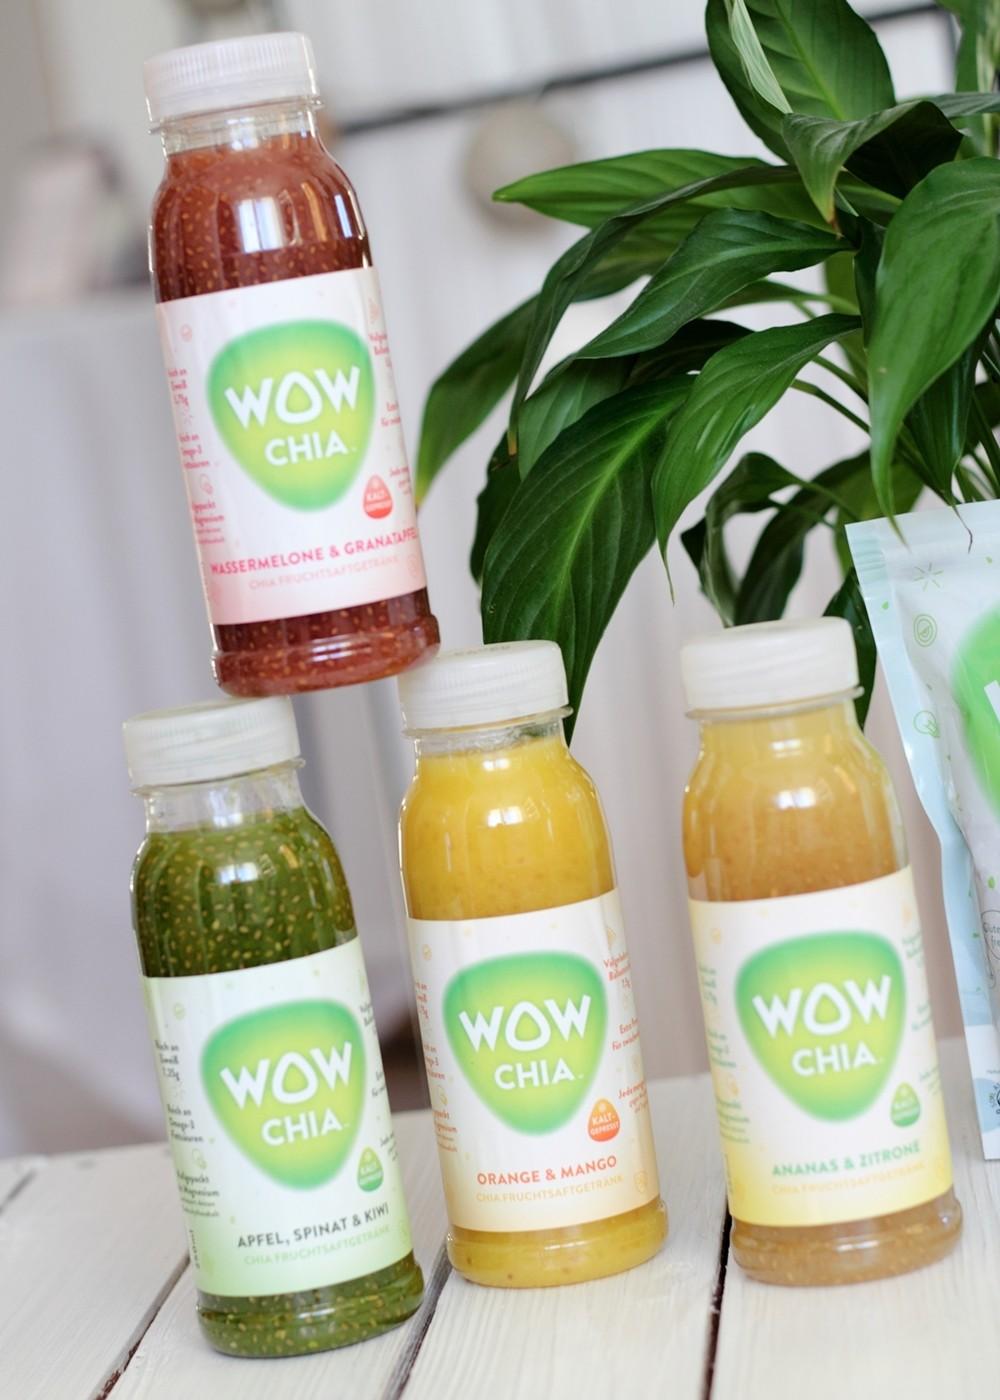 WowChia Fruchtsaftgetränke Sortiment